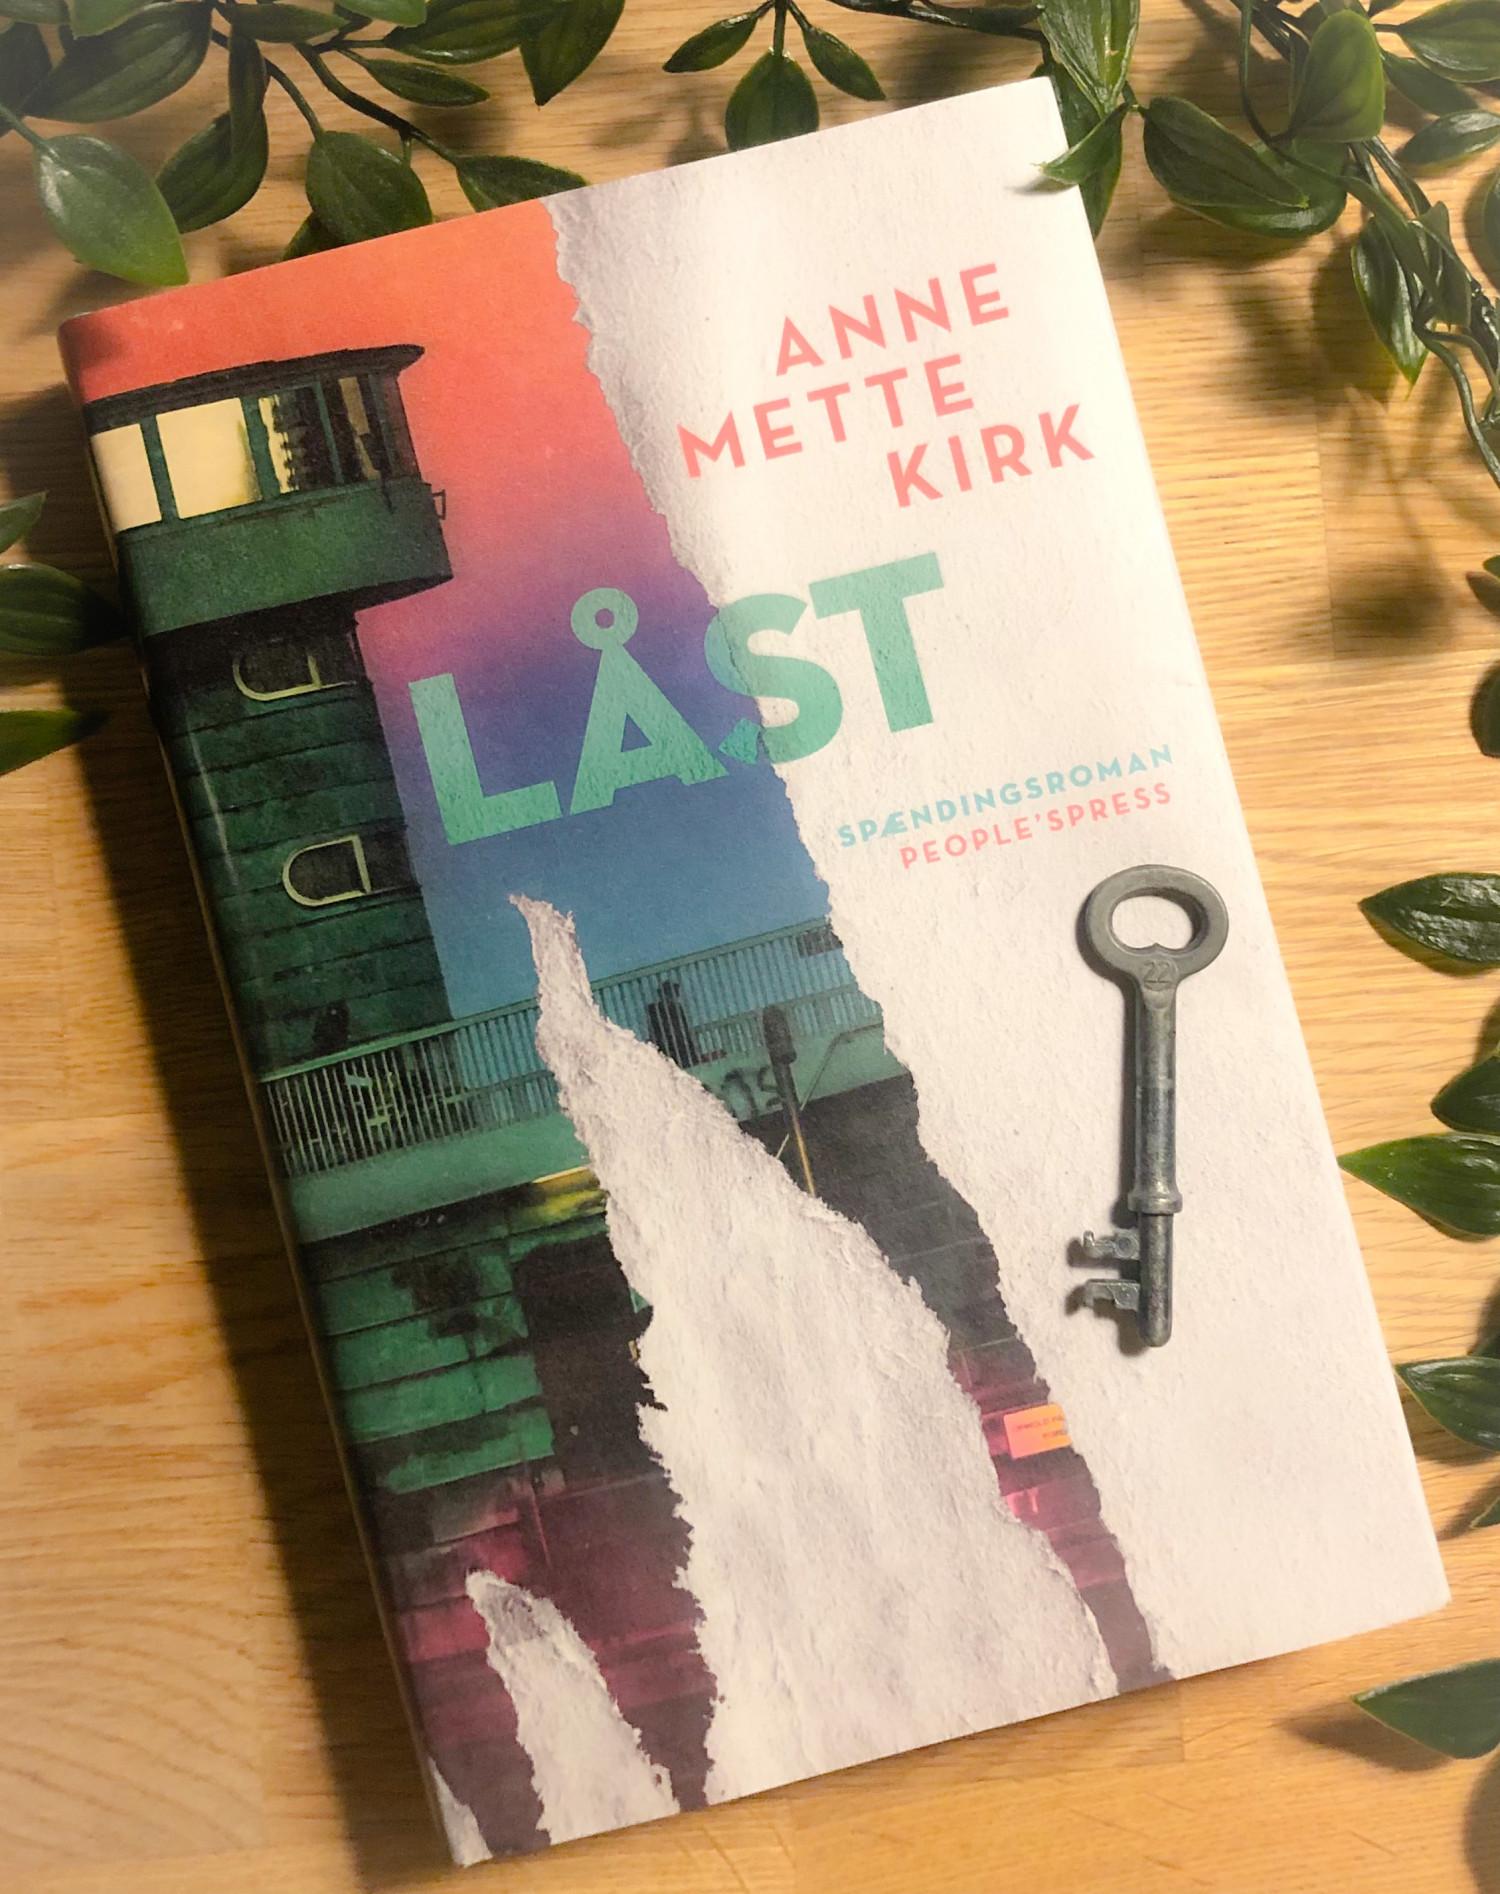 Låst, Anne Mette Kirk, People's Press, Knust, Marc Abildgaard, spændingsroman, krummeskrummelurer, krummeskrummelurer.dk, boganmeldelse, anbefaling, anmeldereksemplar,